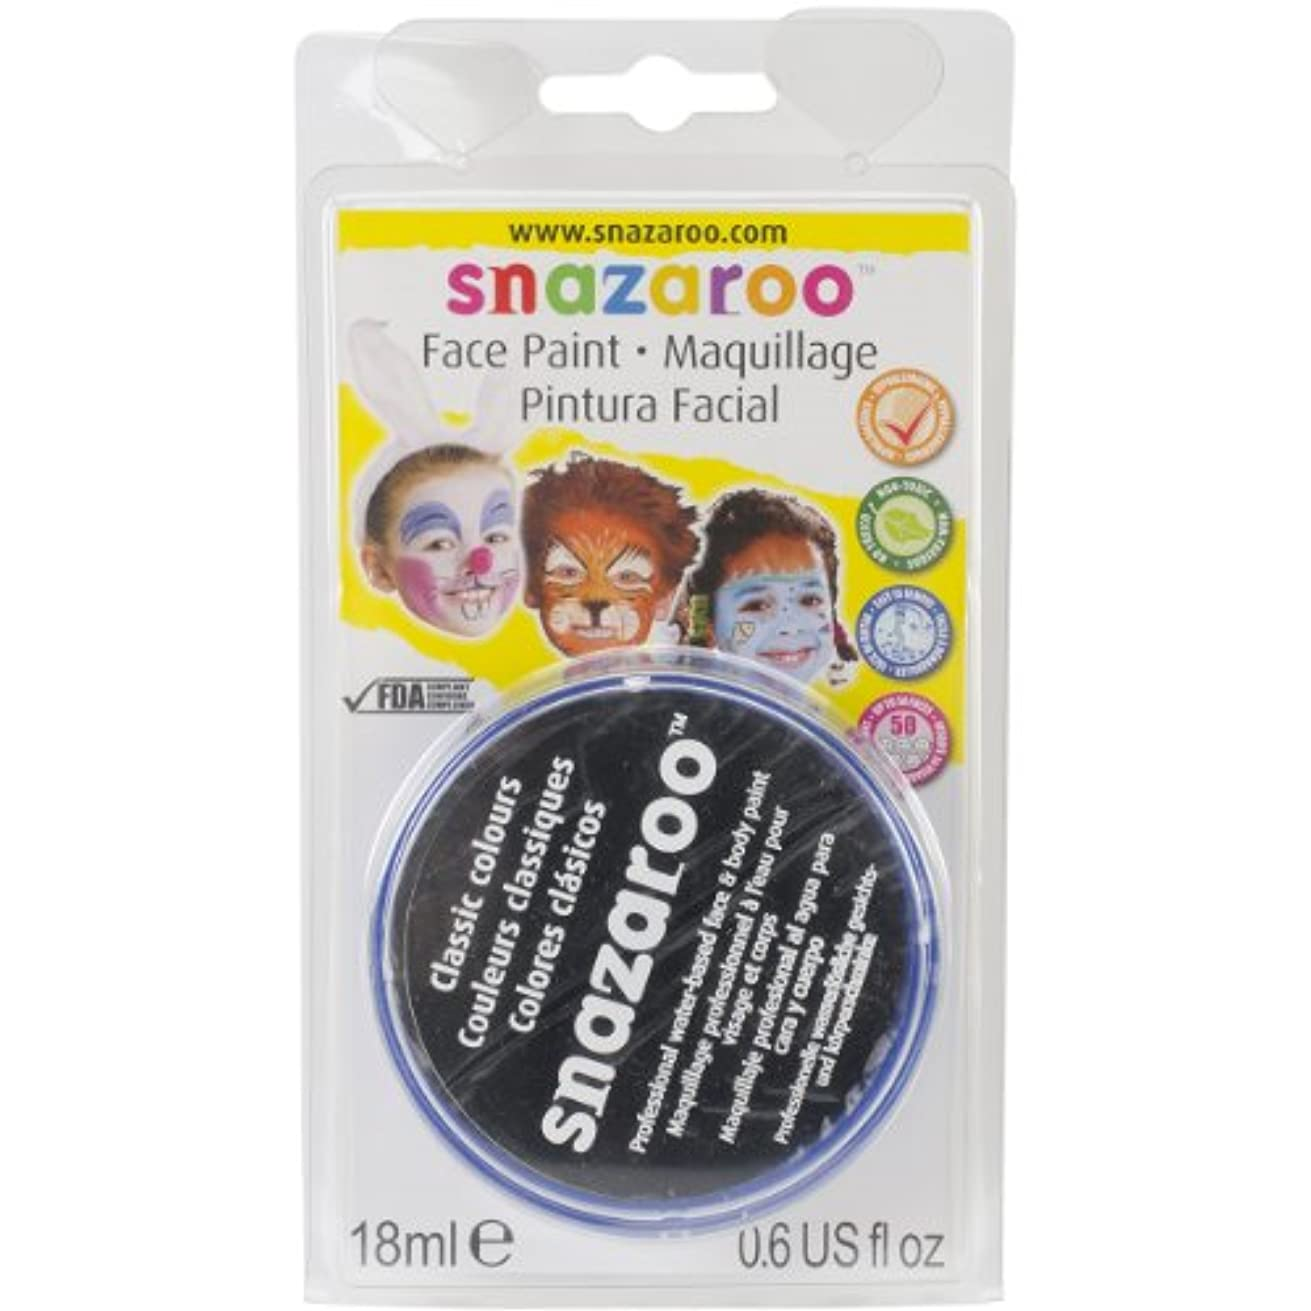 Reeves Snazaroo Face Paint, 18ml, Black